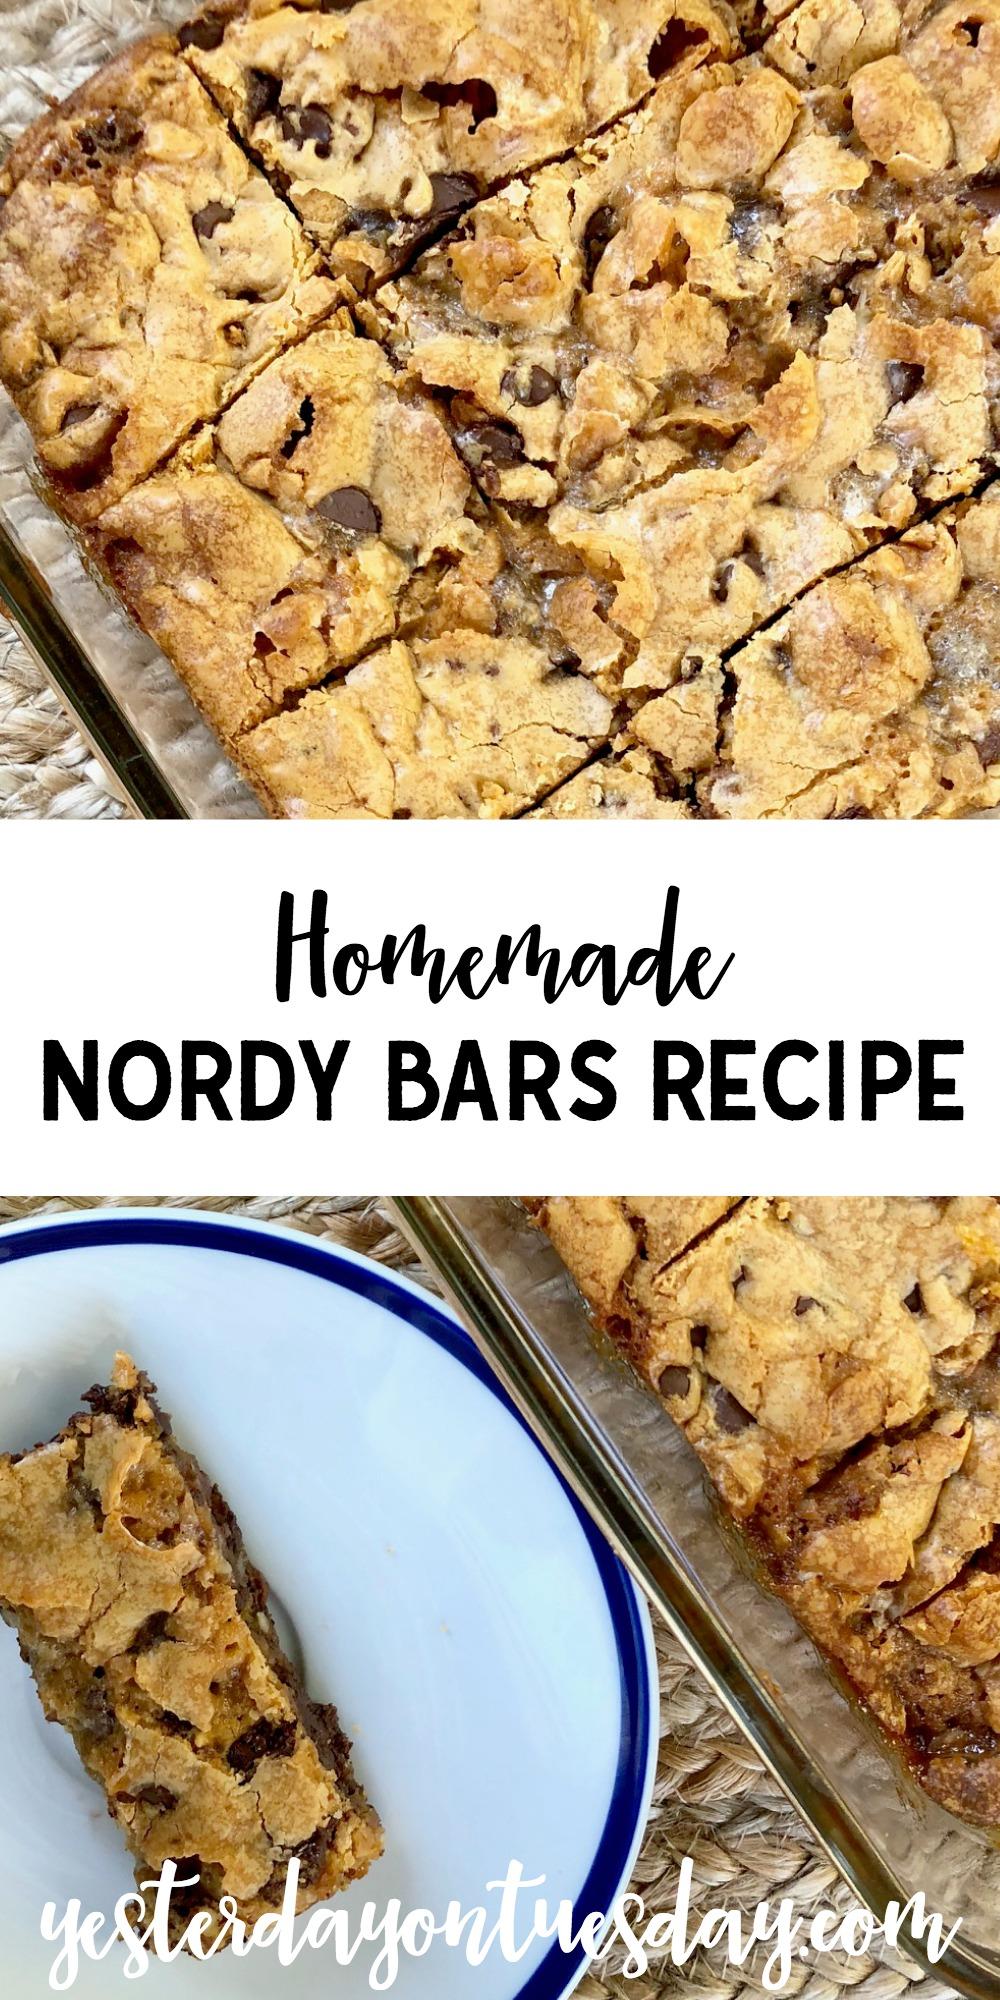 Homemade Nordy Bars Recipe